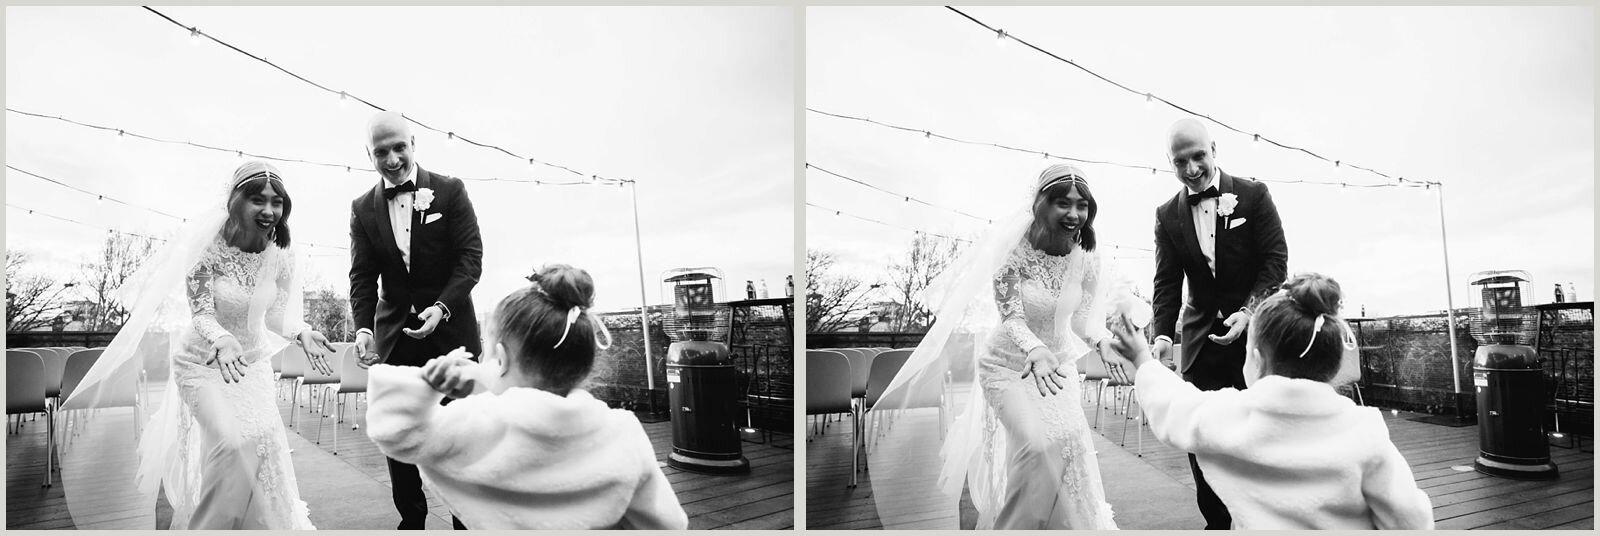 joseph_koprek_wedding_melbourne_the_prince_deck_0067.jpg